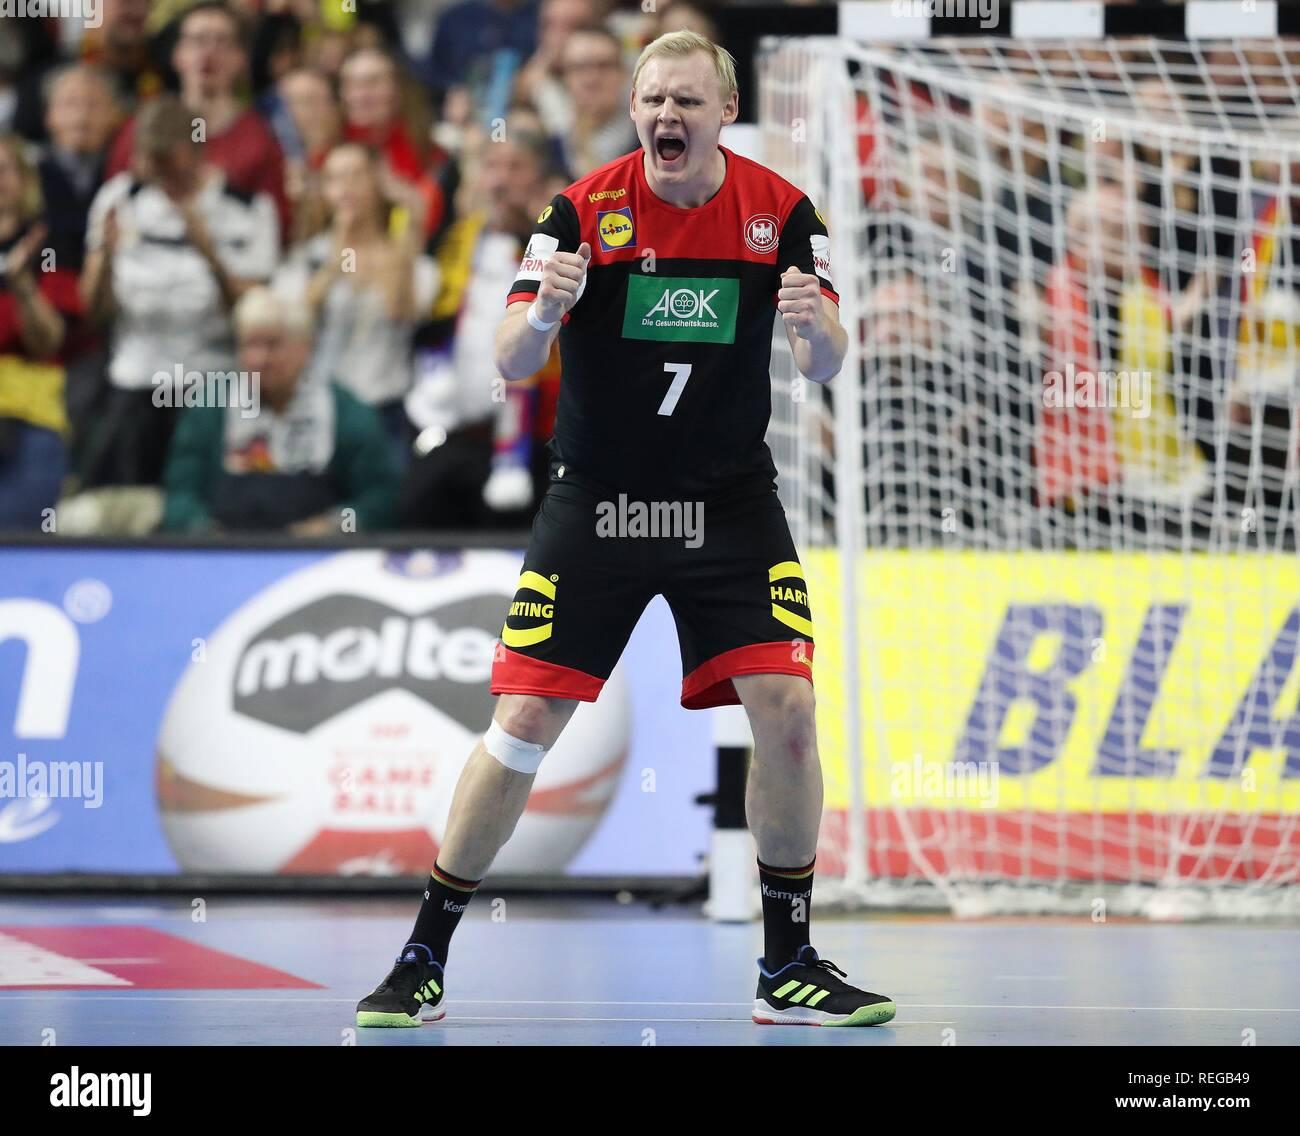 firo: 21.01.2019, Handball: World Cup World Cup Main Round Croatia Croatia - Germany 21:22 GEstik, jubilation, Patrick Wiencek   usage worldwide - Stock Image